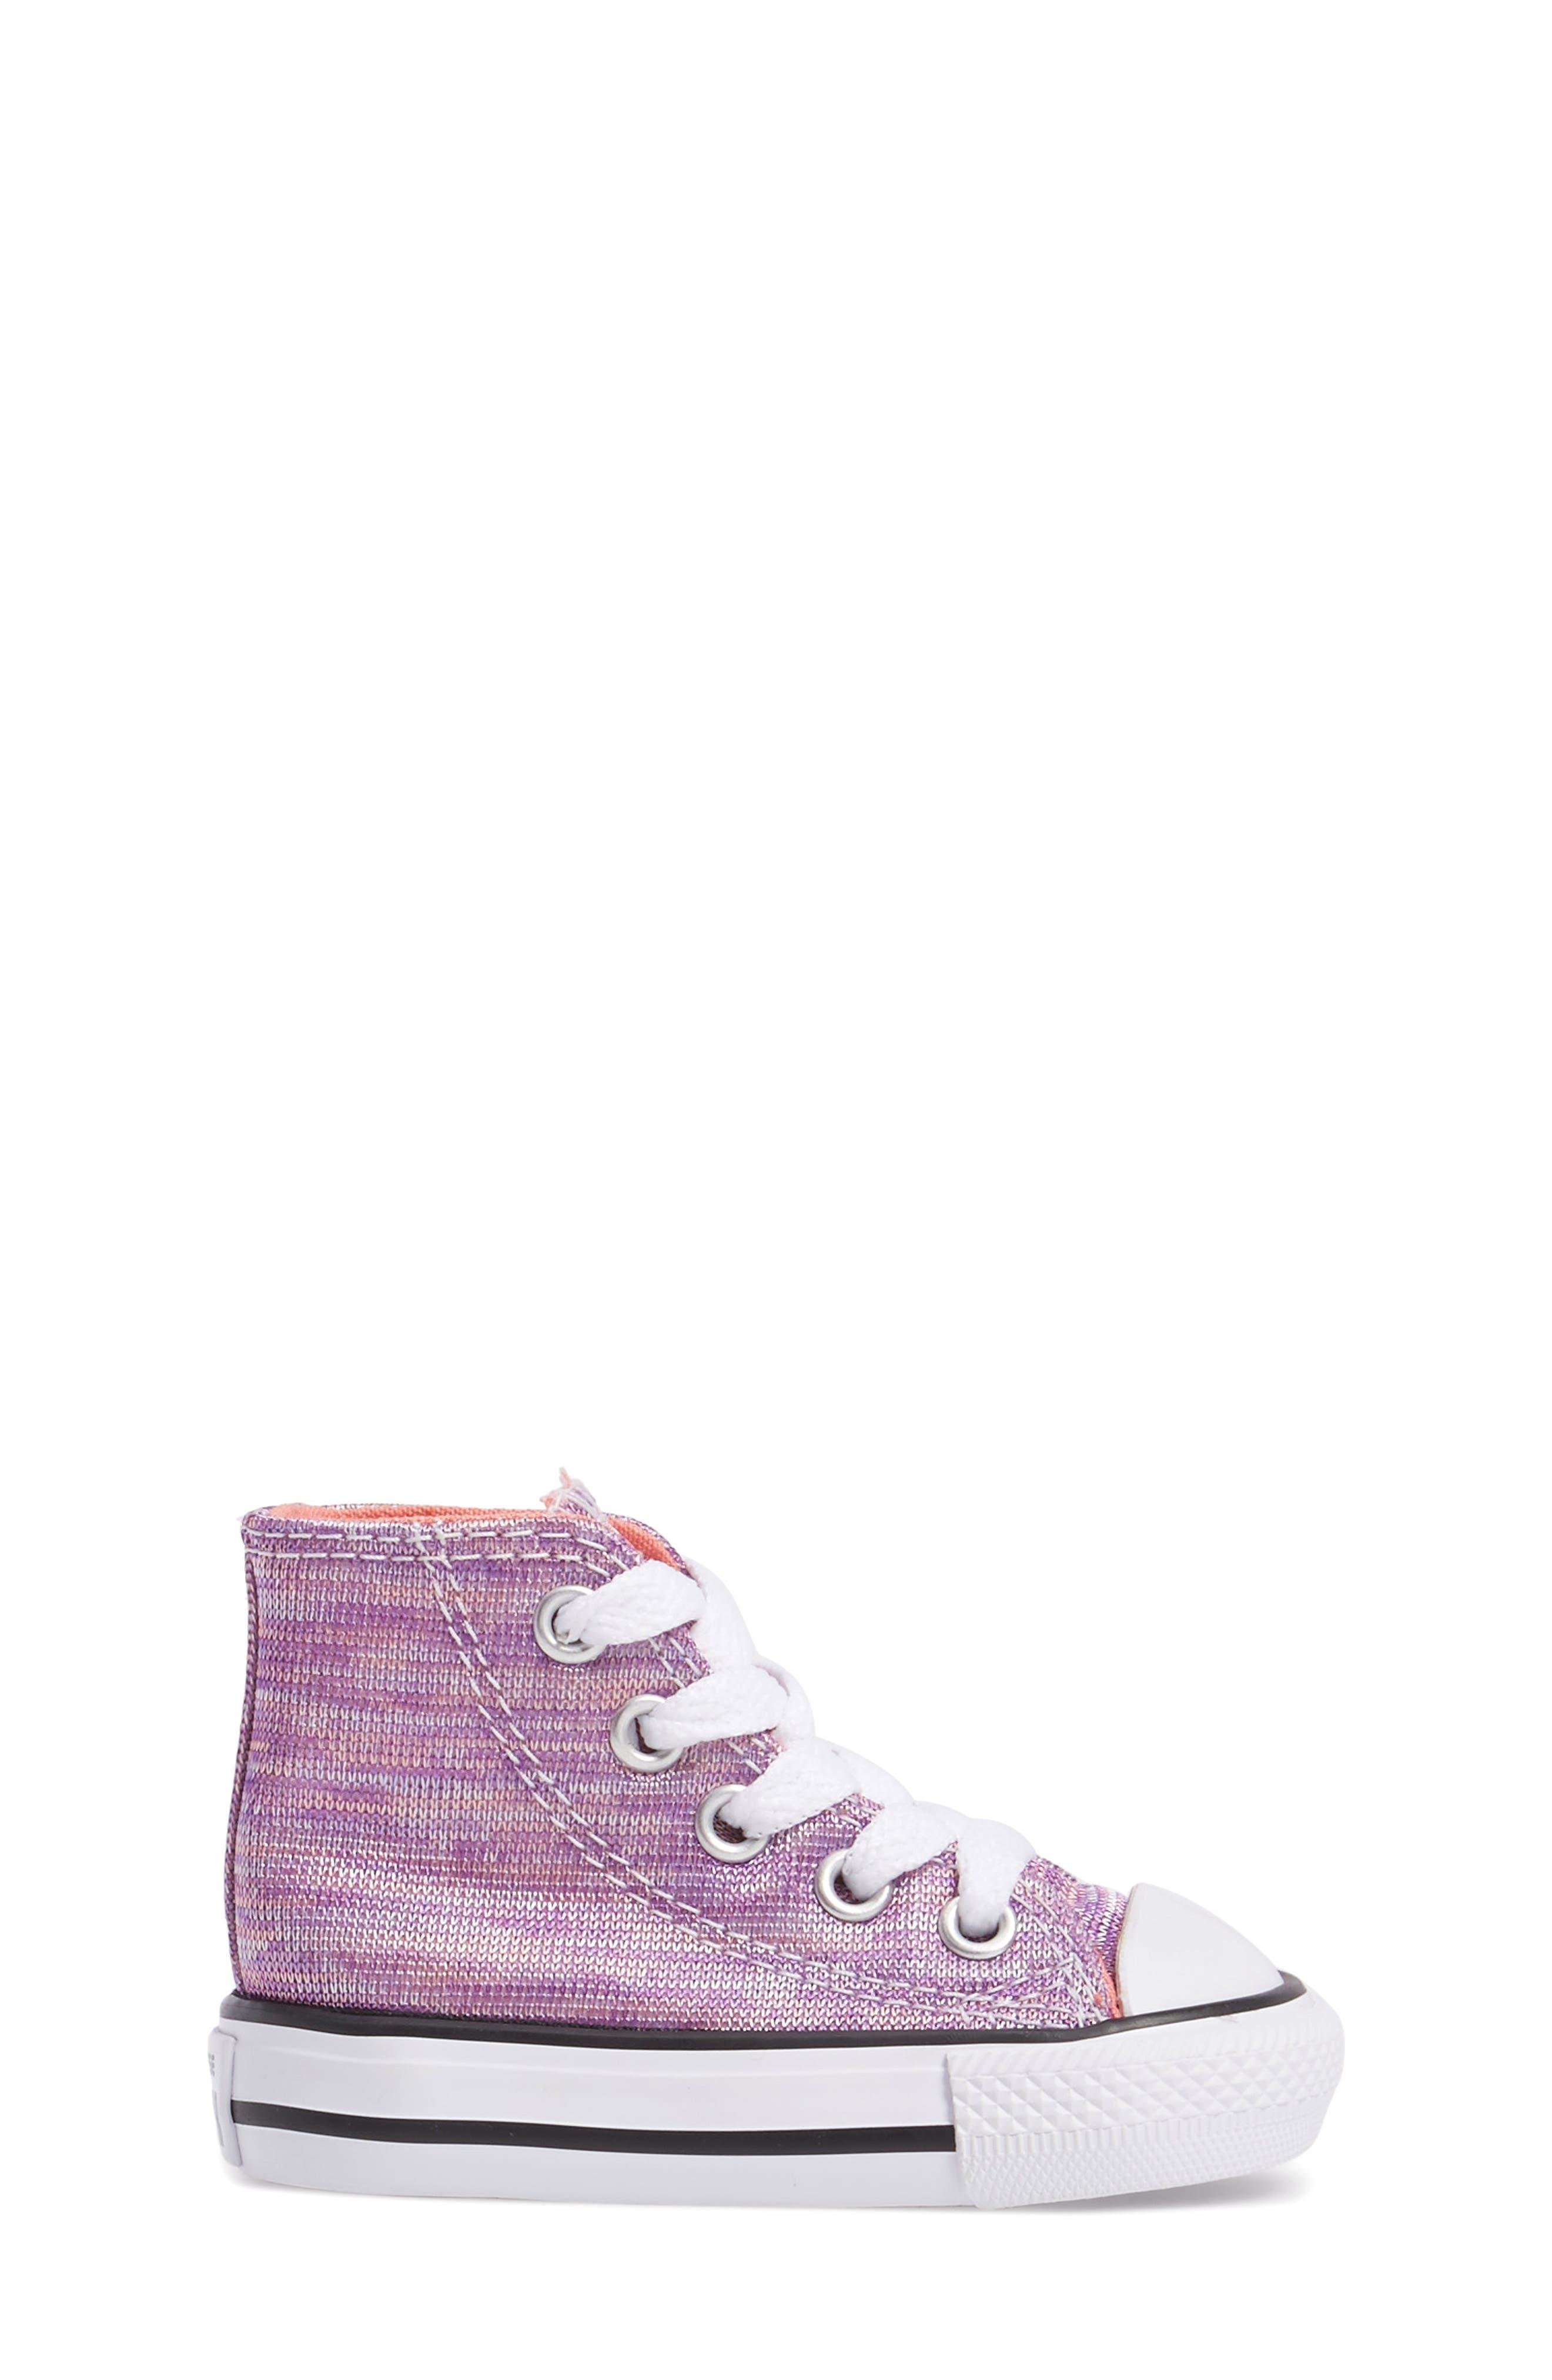 Alternate Image 3  - Converse Chuck Taylor® All Star® Knit High Top Sneaker (Baby, Walker, Toddler & Little Kid)